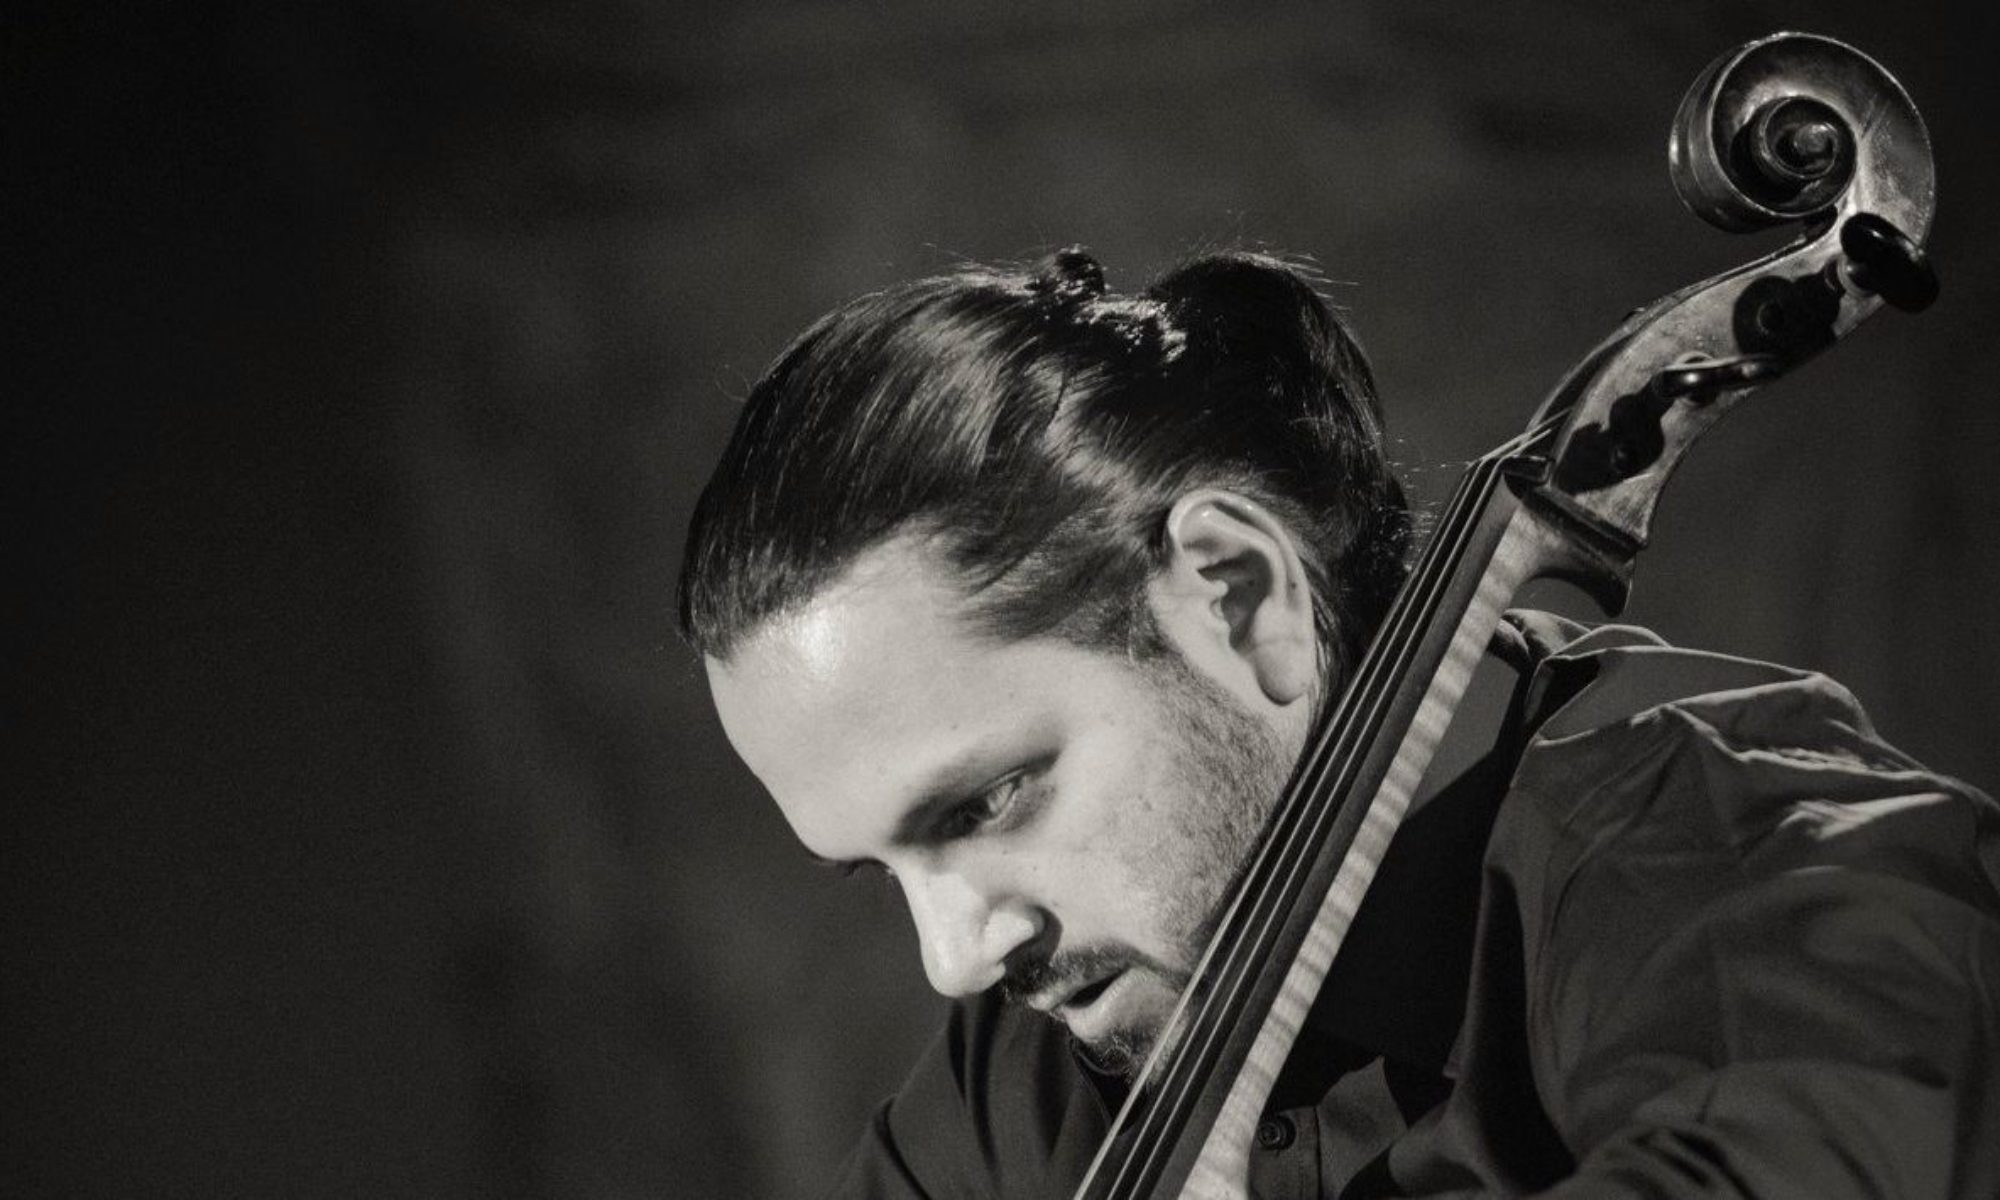 Christoph Adrian Kuhn